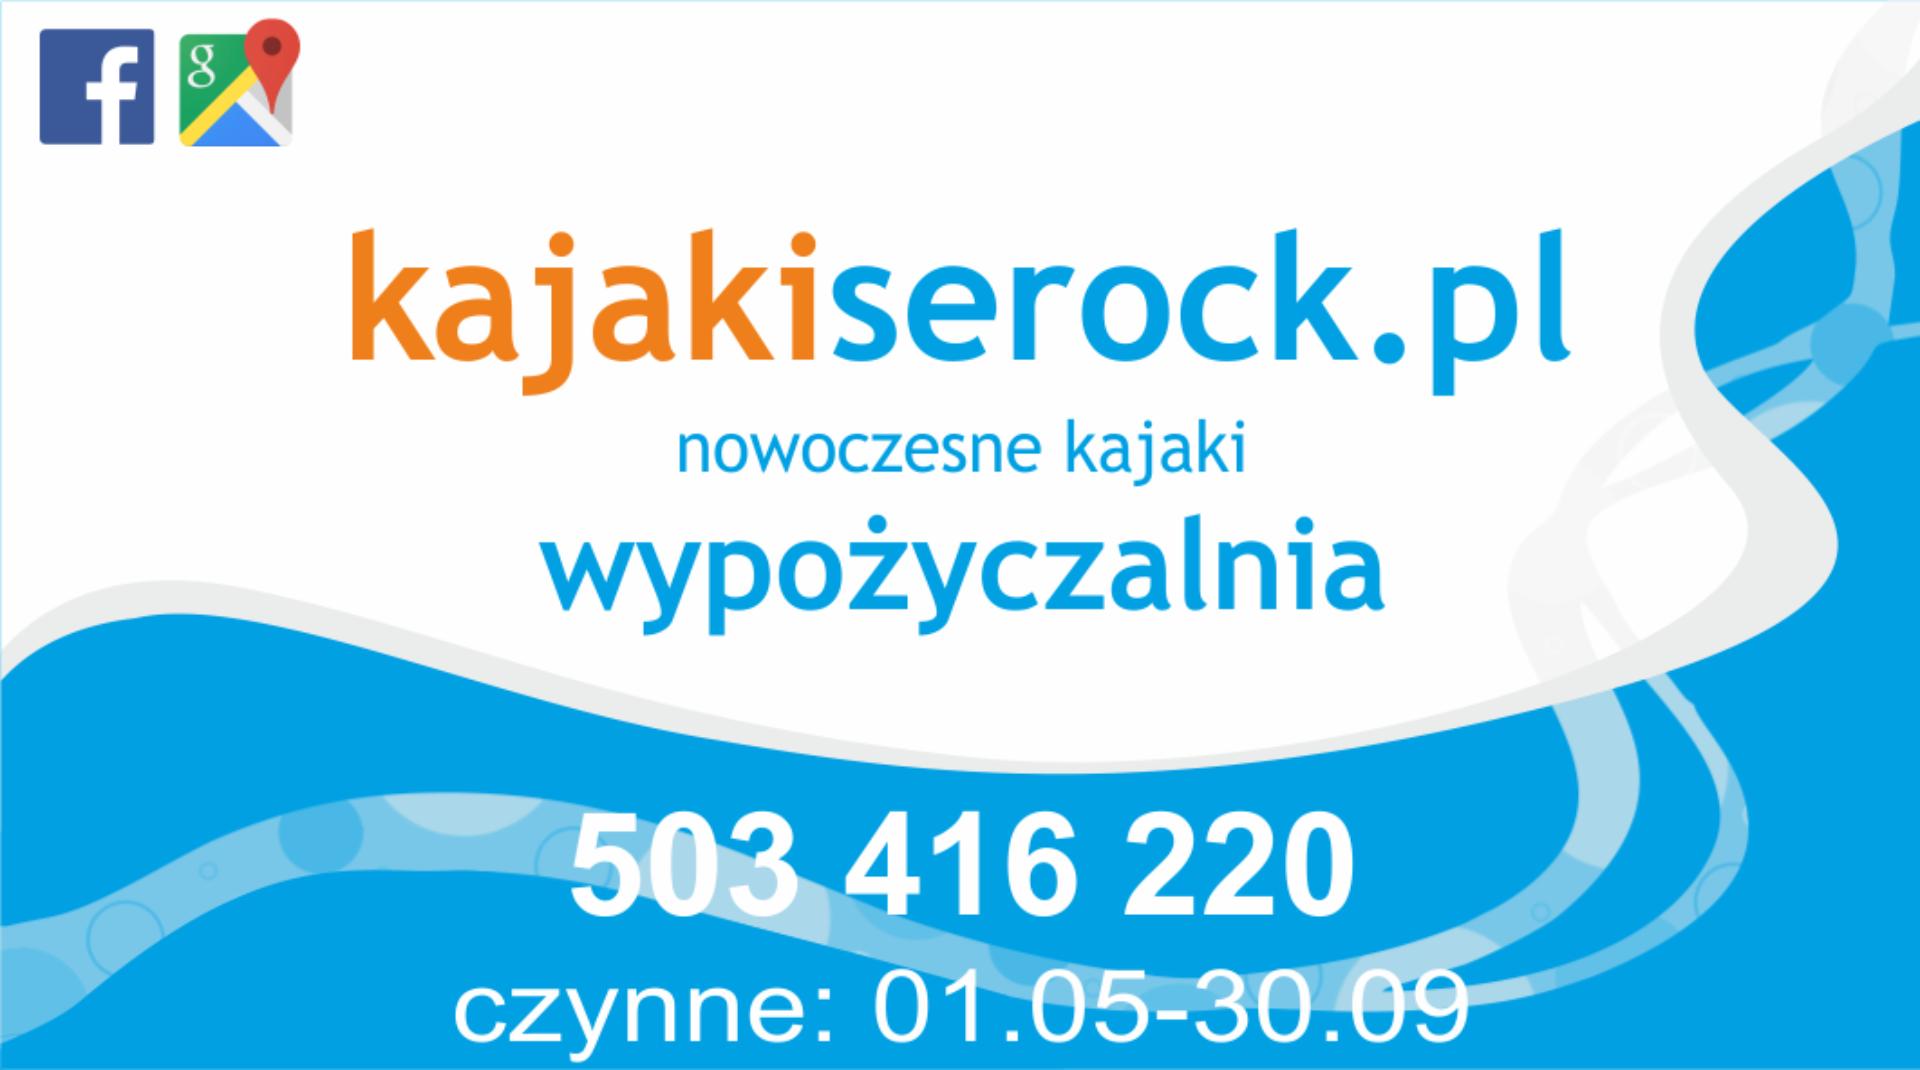 Kajaki Serock